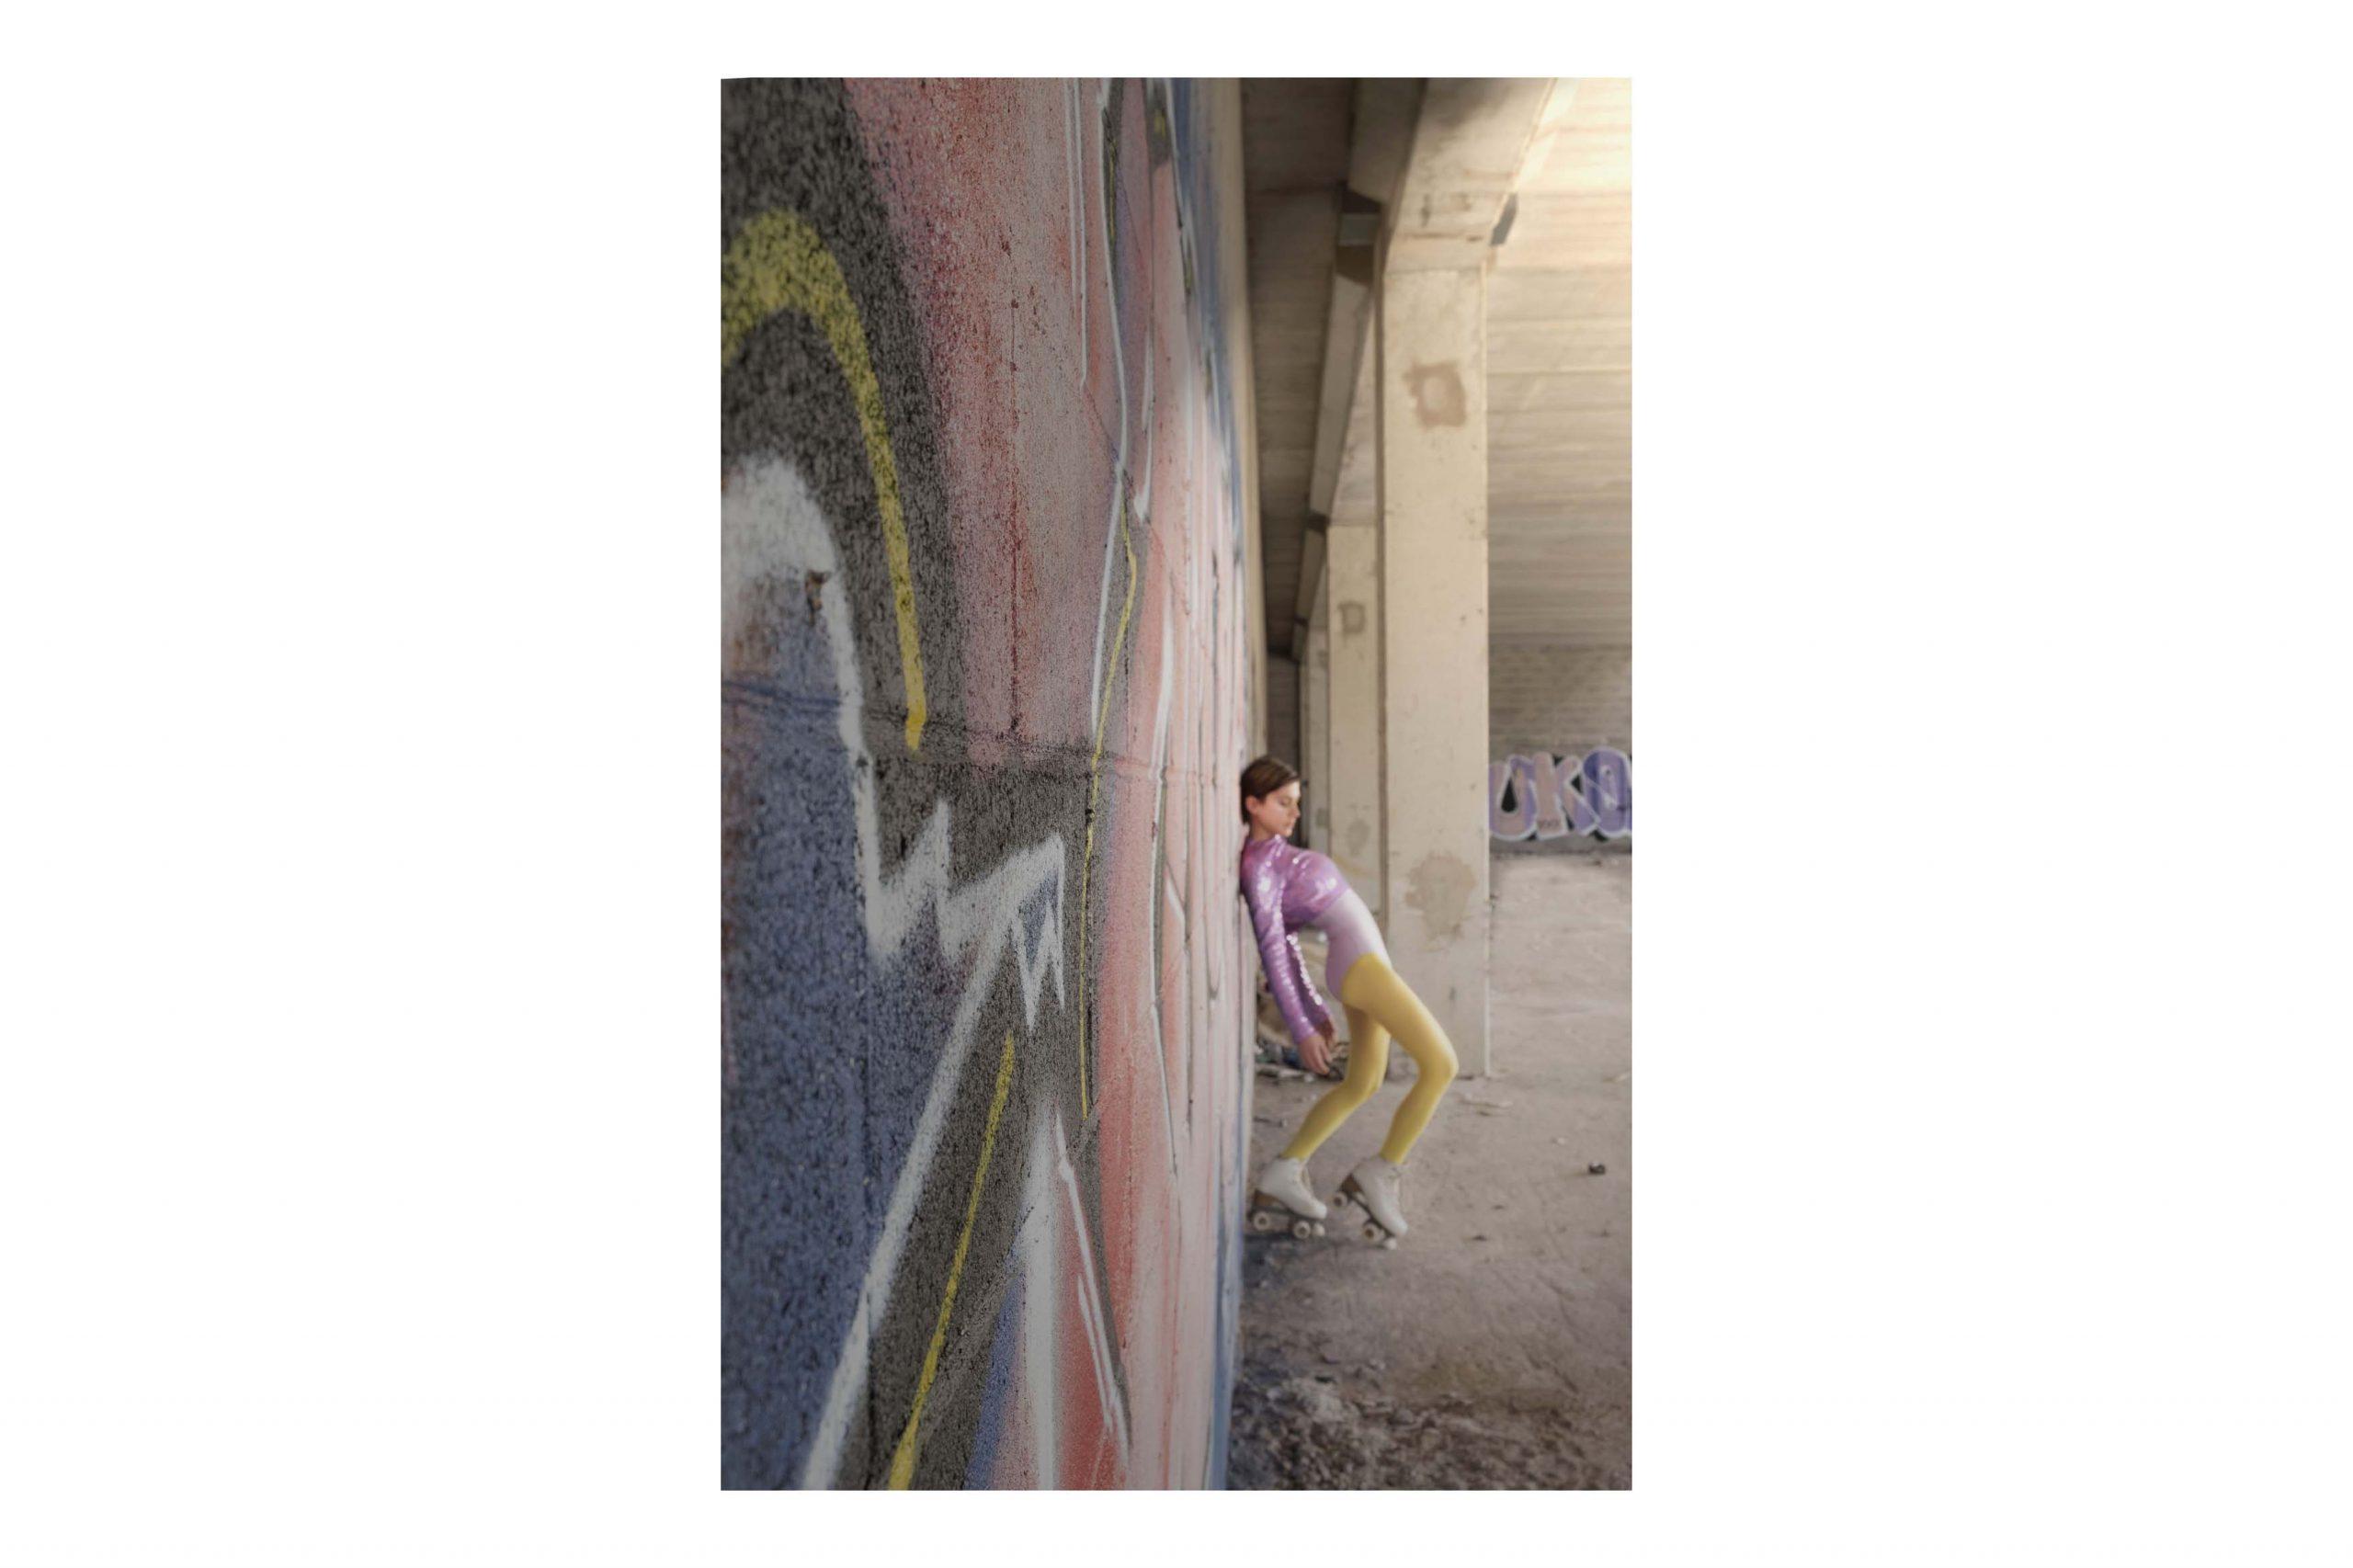 Categorie: Fine Art, Glamour, Portrait, Sport - Photographer: NOEMI PROIETTI - Mua: DEBORA VINCI - Location: Ponte Di Nona, Via Prenestina, Roma